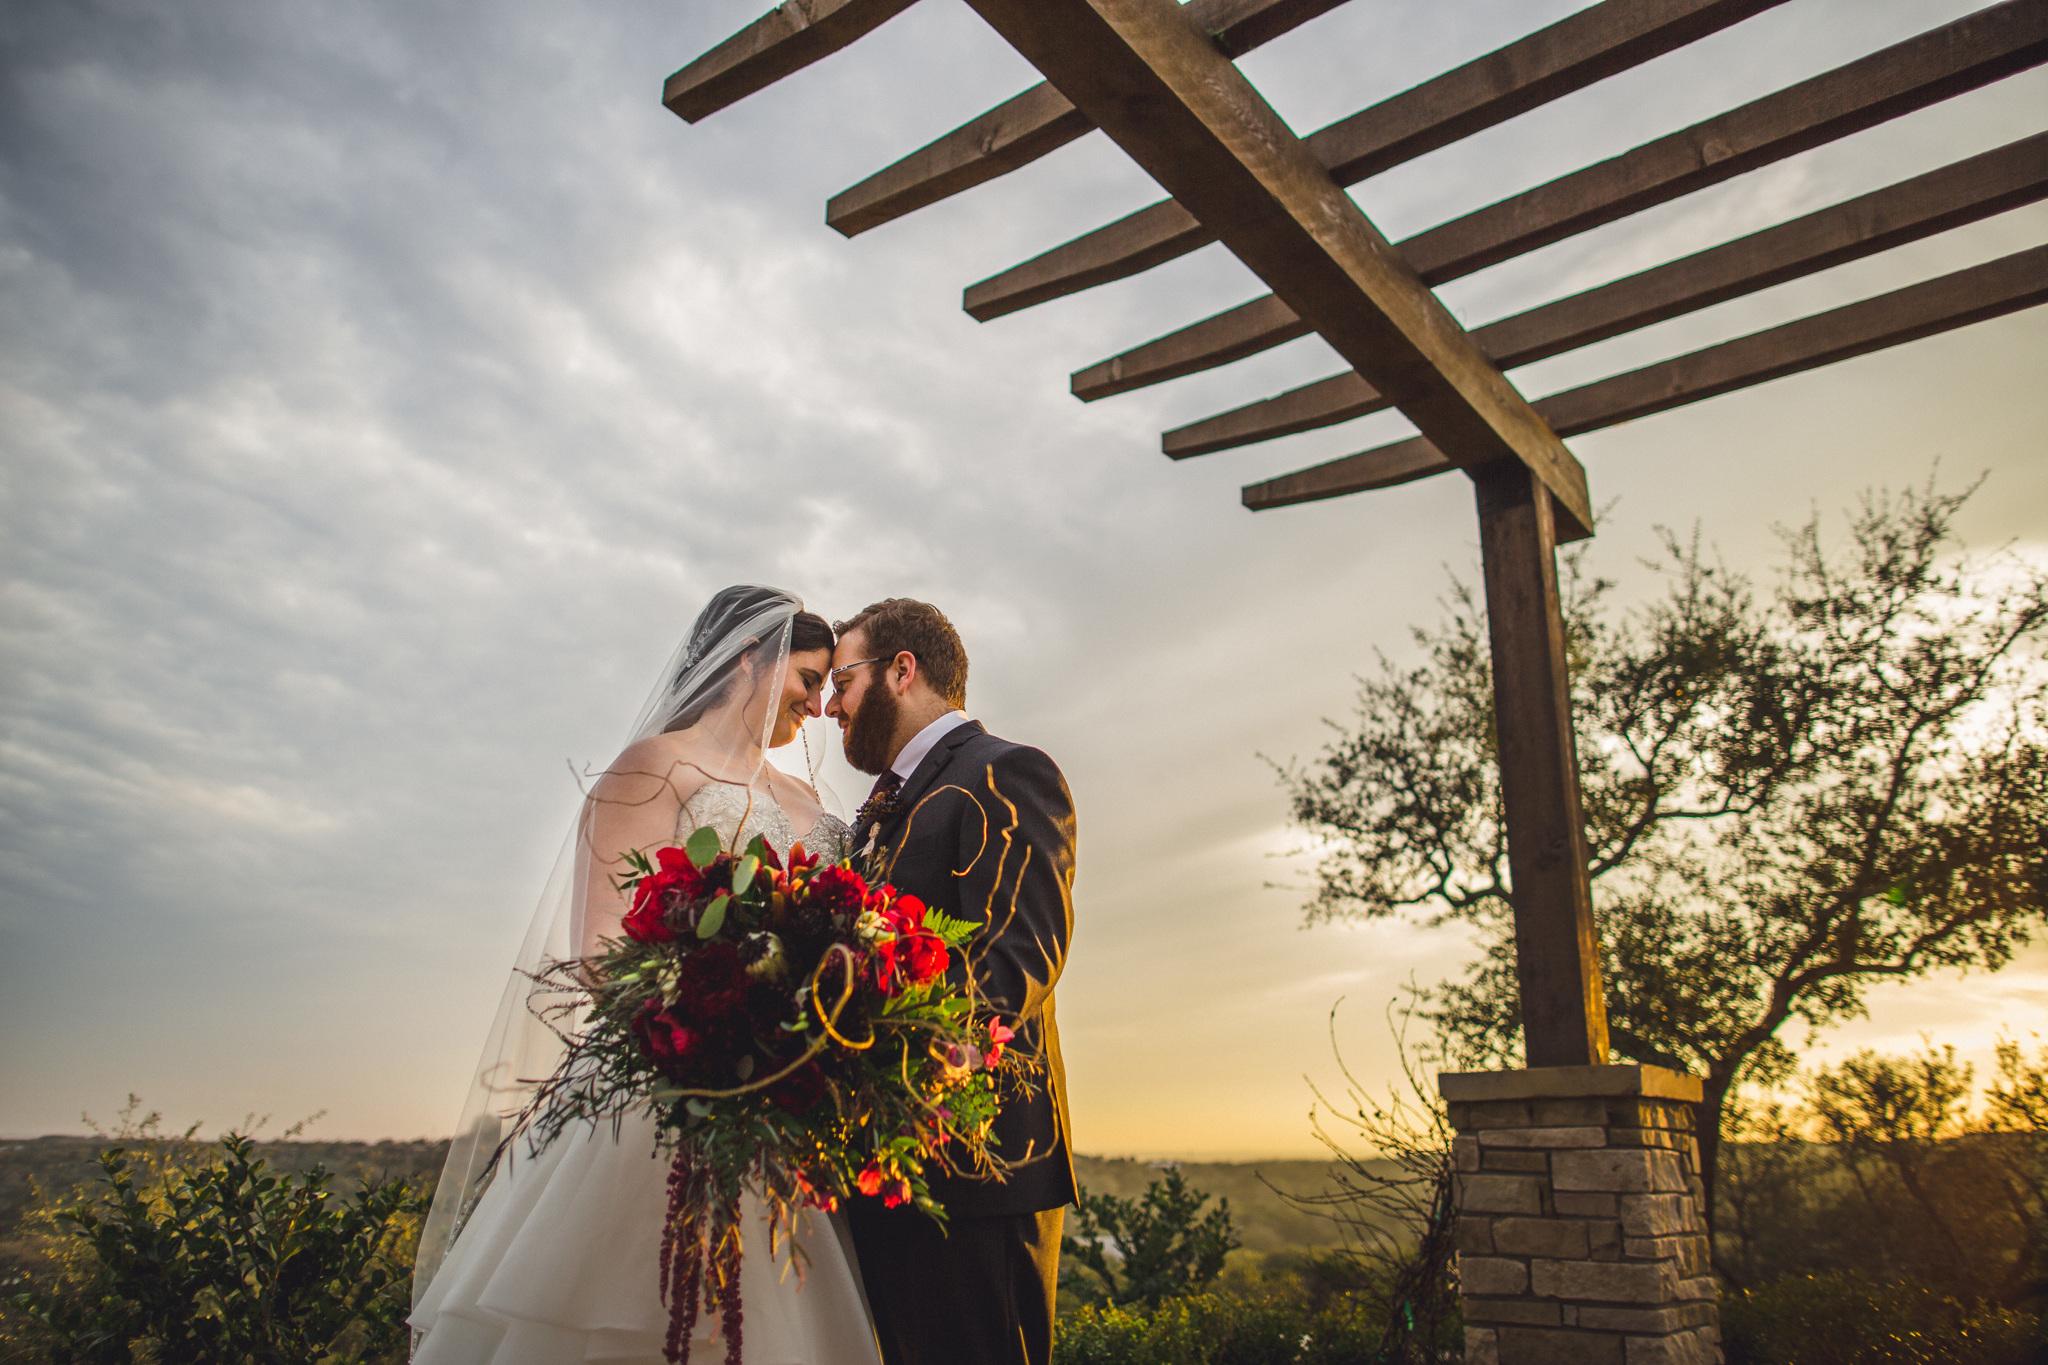 Erin-Scott-wedding-happydaymedia-428.jpg